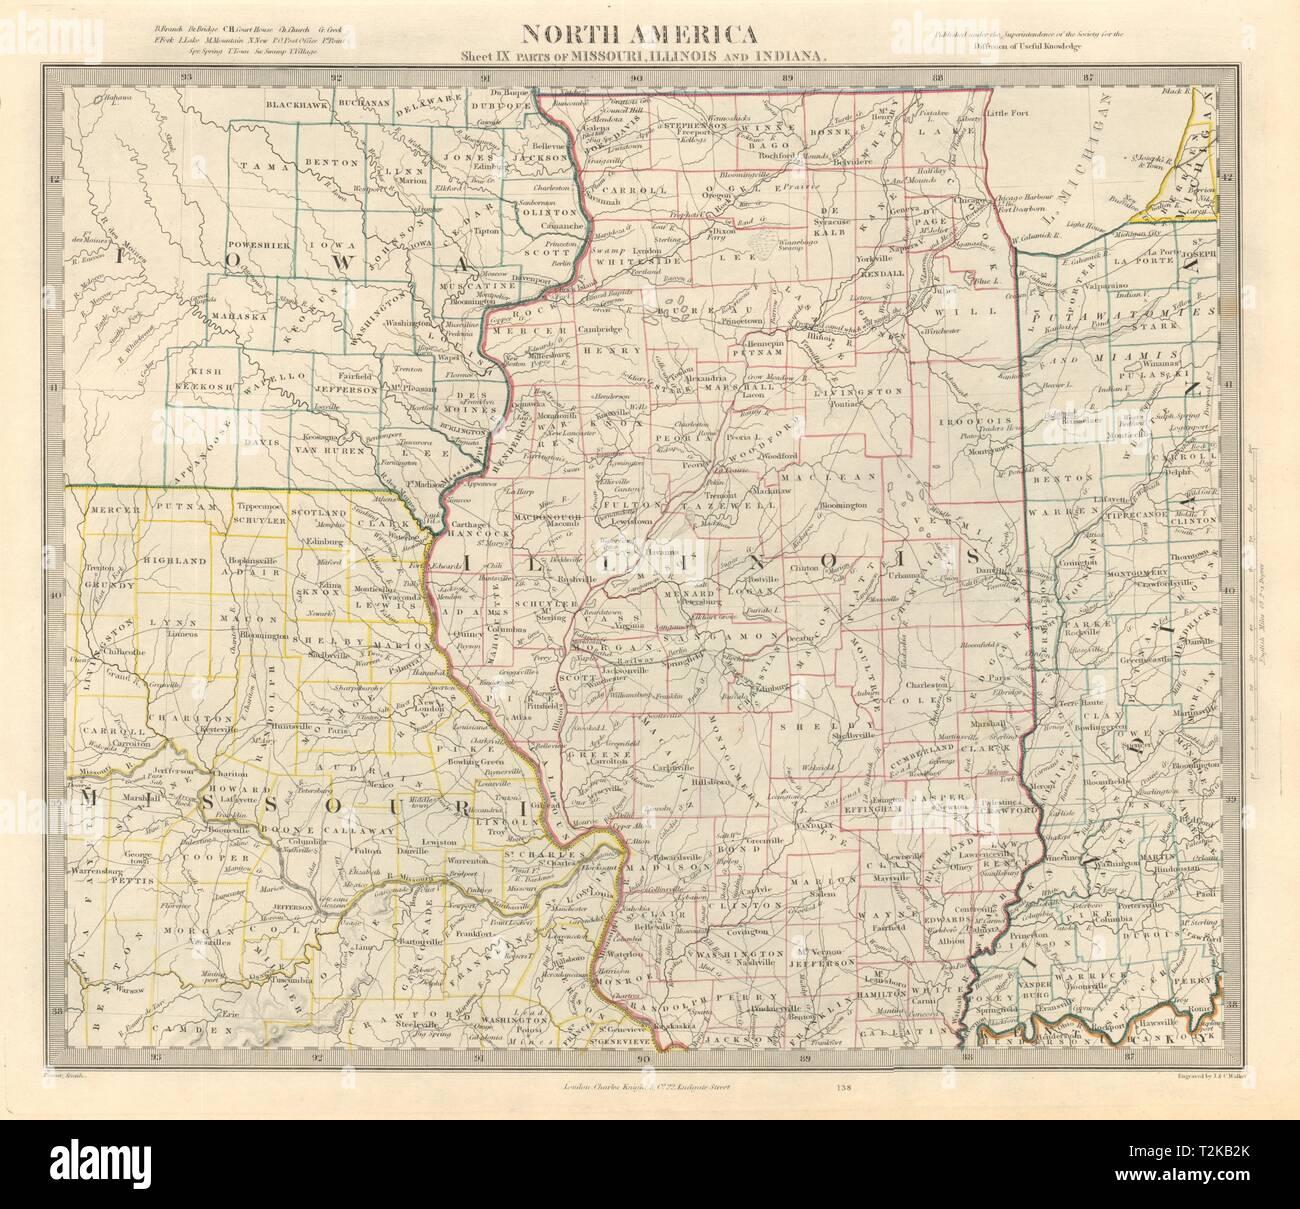 USA MIDWEST. Missouri Illinois Indiana Iowa. Chicago St ... on map of north east illinois, map of east st. louis illinois, map of fox river grove illinois, map missouri illinois, map of oglesby illinois, detailed road map of illinois, map of chicagoland illinois, map of bloomington illinois, map of marion illinois, map of north central illinois, map of michigan and illinois, map of crawford county illinois, map of angola illinois, map of ohio river illinois, map of northwestern illinois, map of auburn illinois, map of east central illinois, detailed map northern illinois, map of golconda illinois, map kentucky illinois,